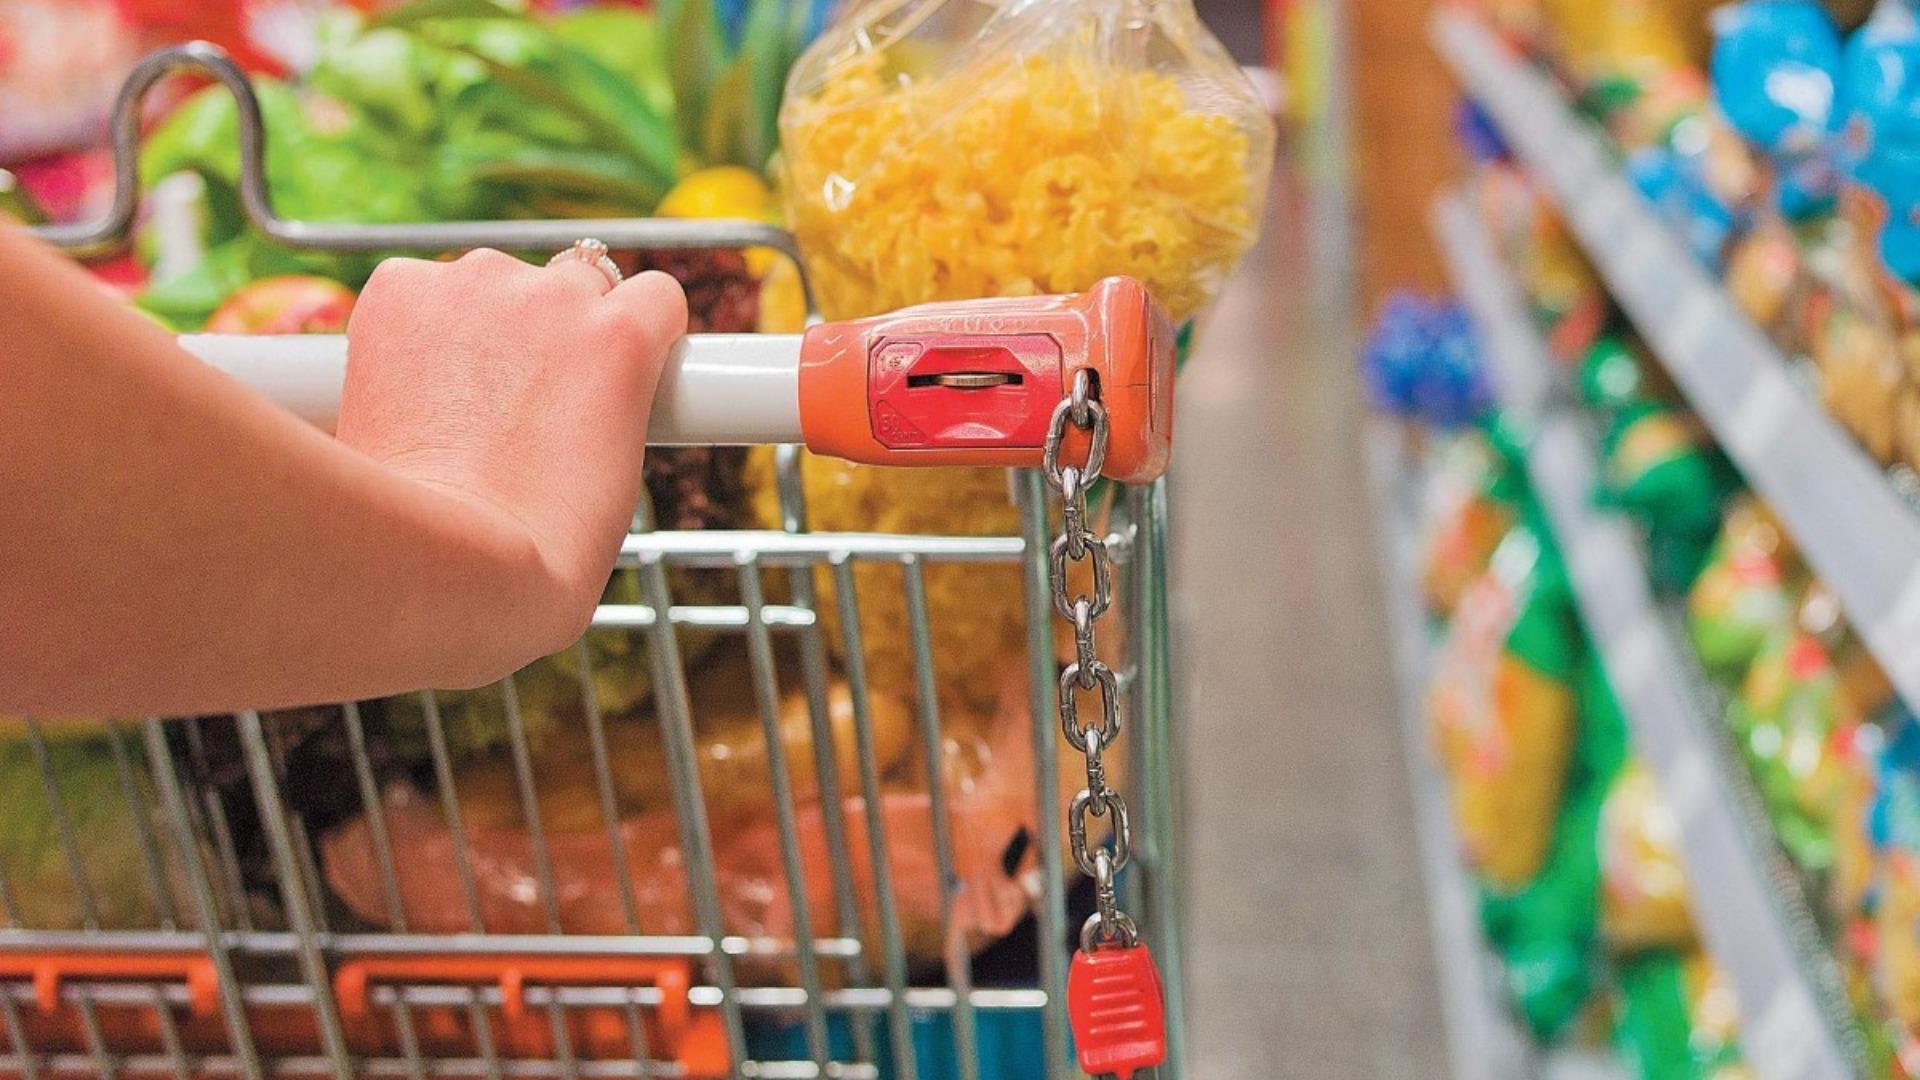 Codhez exhorta al gobierno a garantizar acceso a alimentos en medio de pandemia